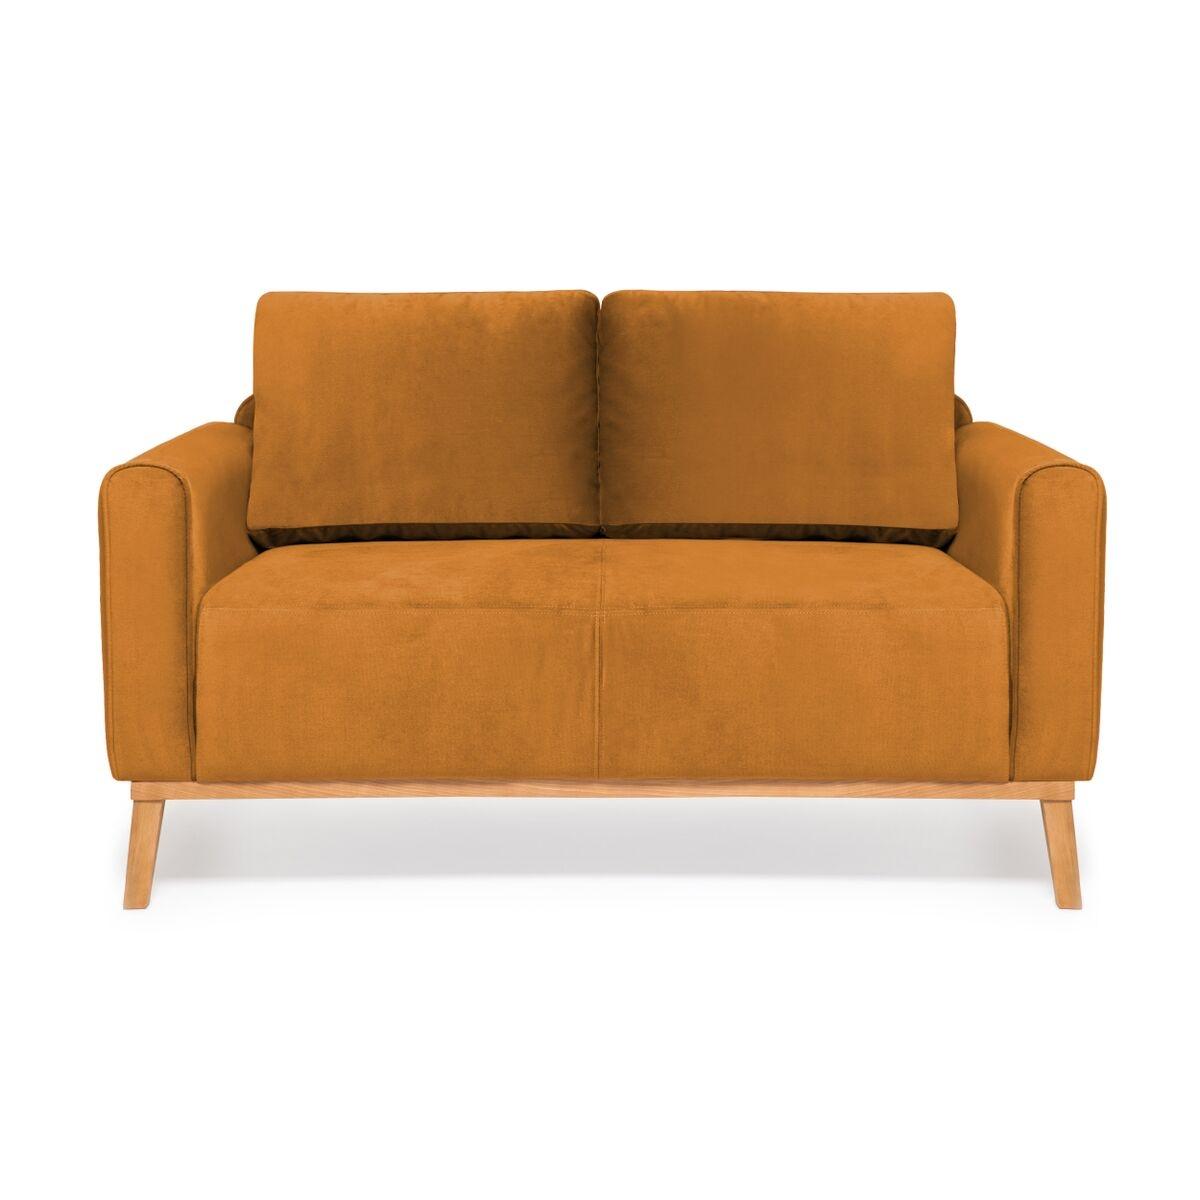 Canapea Fixa 2 locuri Milton Trend Mustard